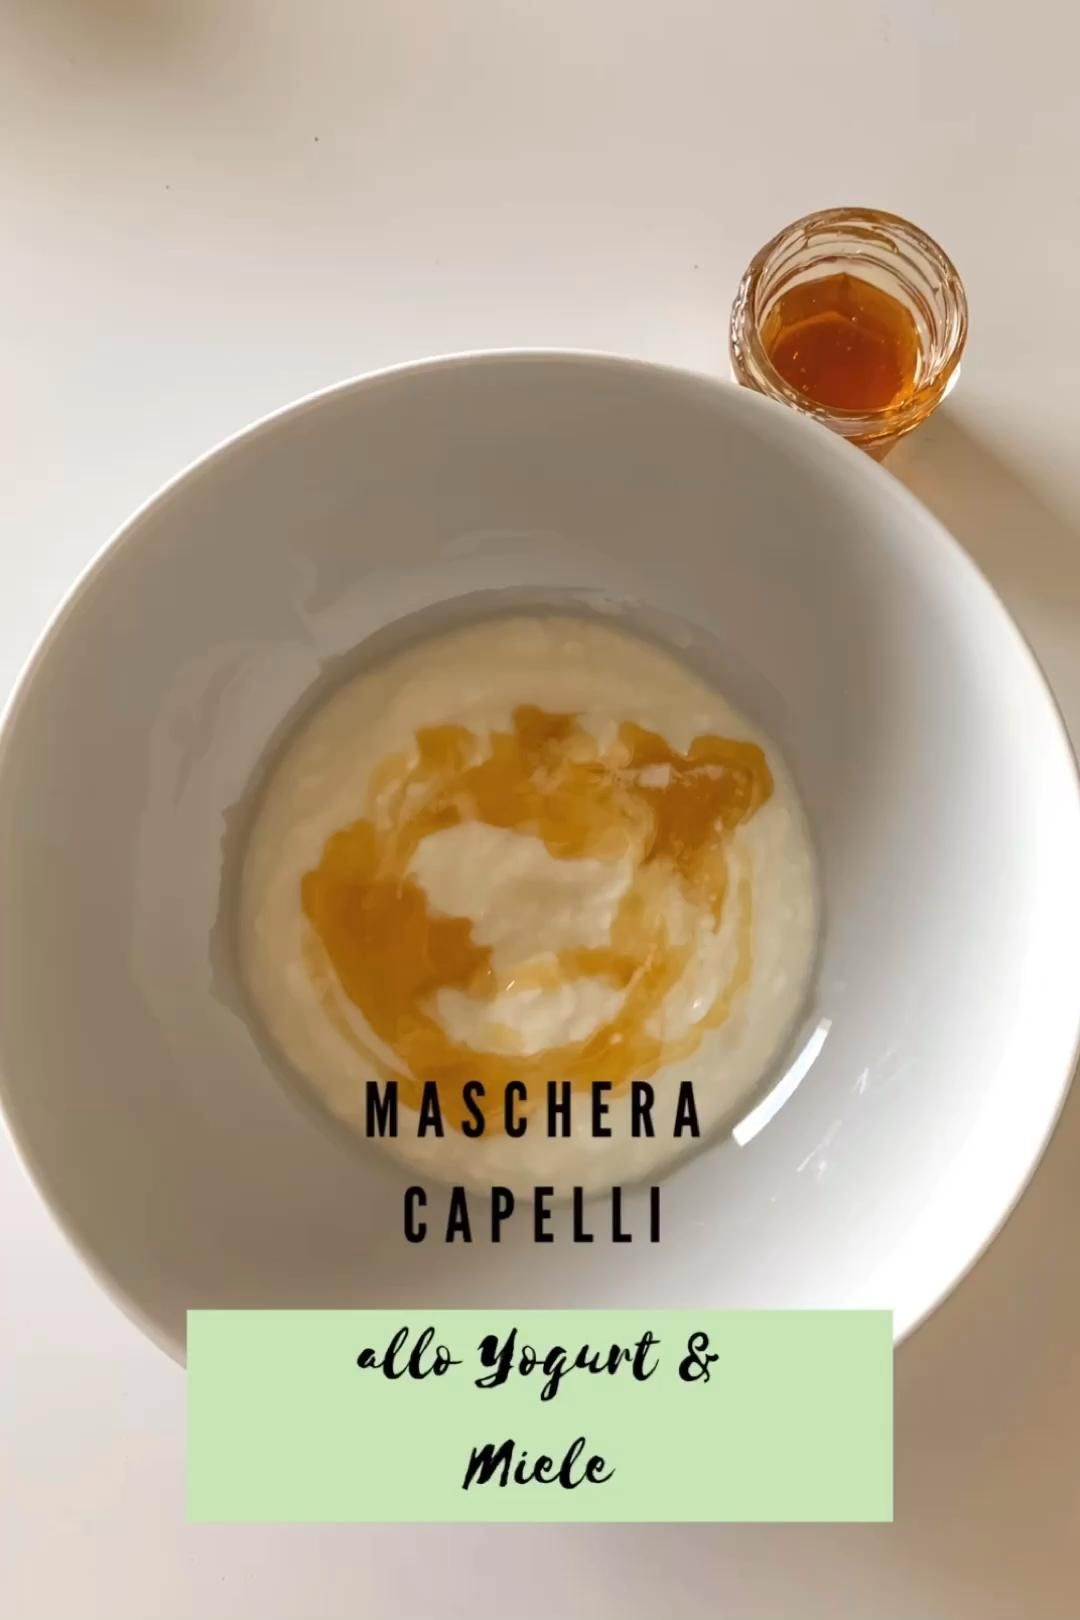 Maschera Capelli allo yogurt e miele – Hair Mask Blog 2020